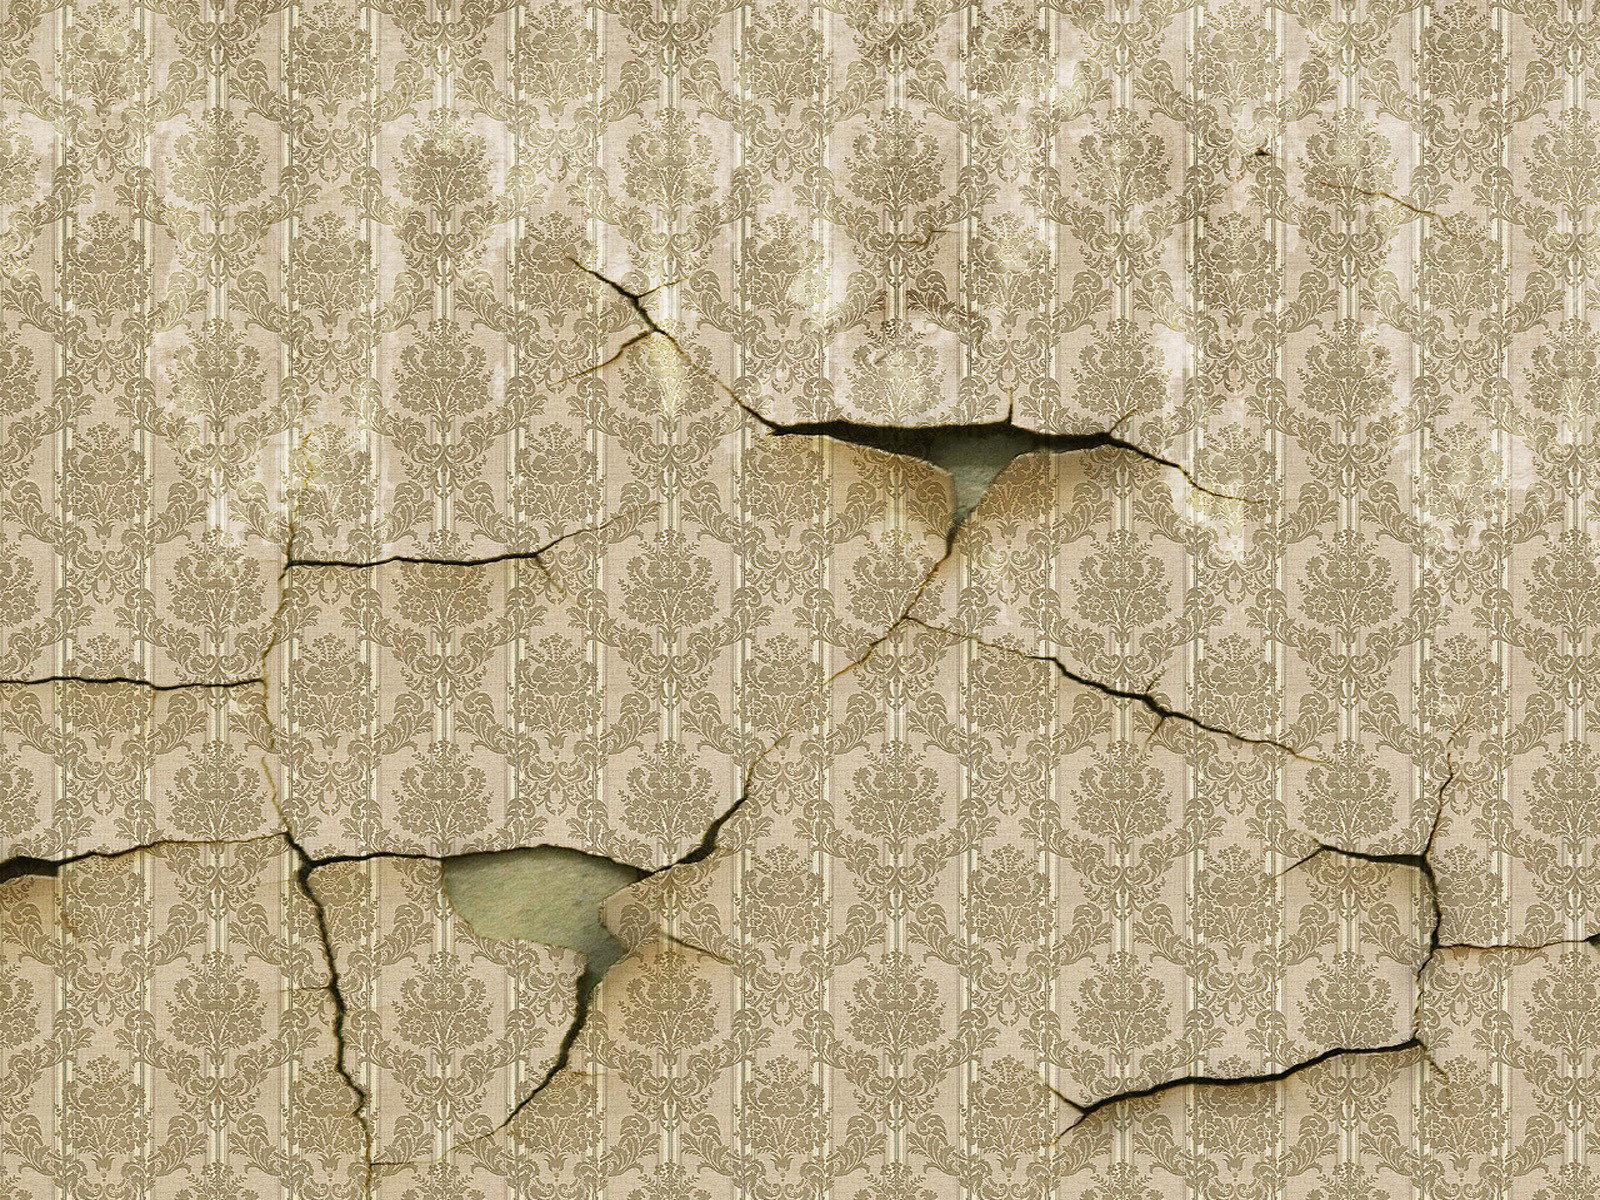 Torn wallpaper desktop wallpaper pictures Torn wallpaper photos Torn 1600x1200